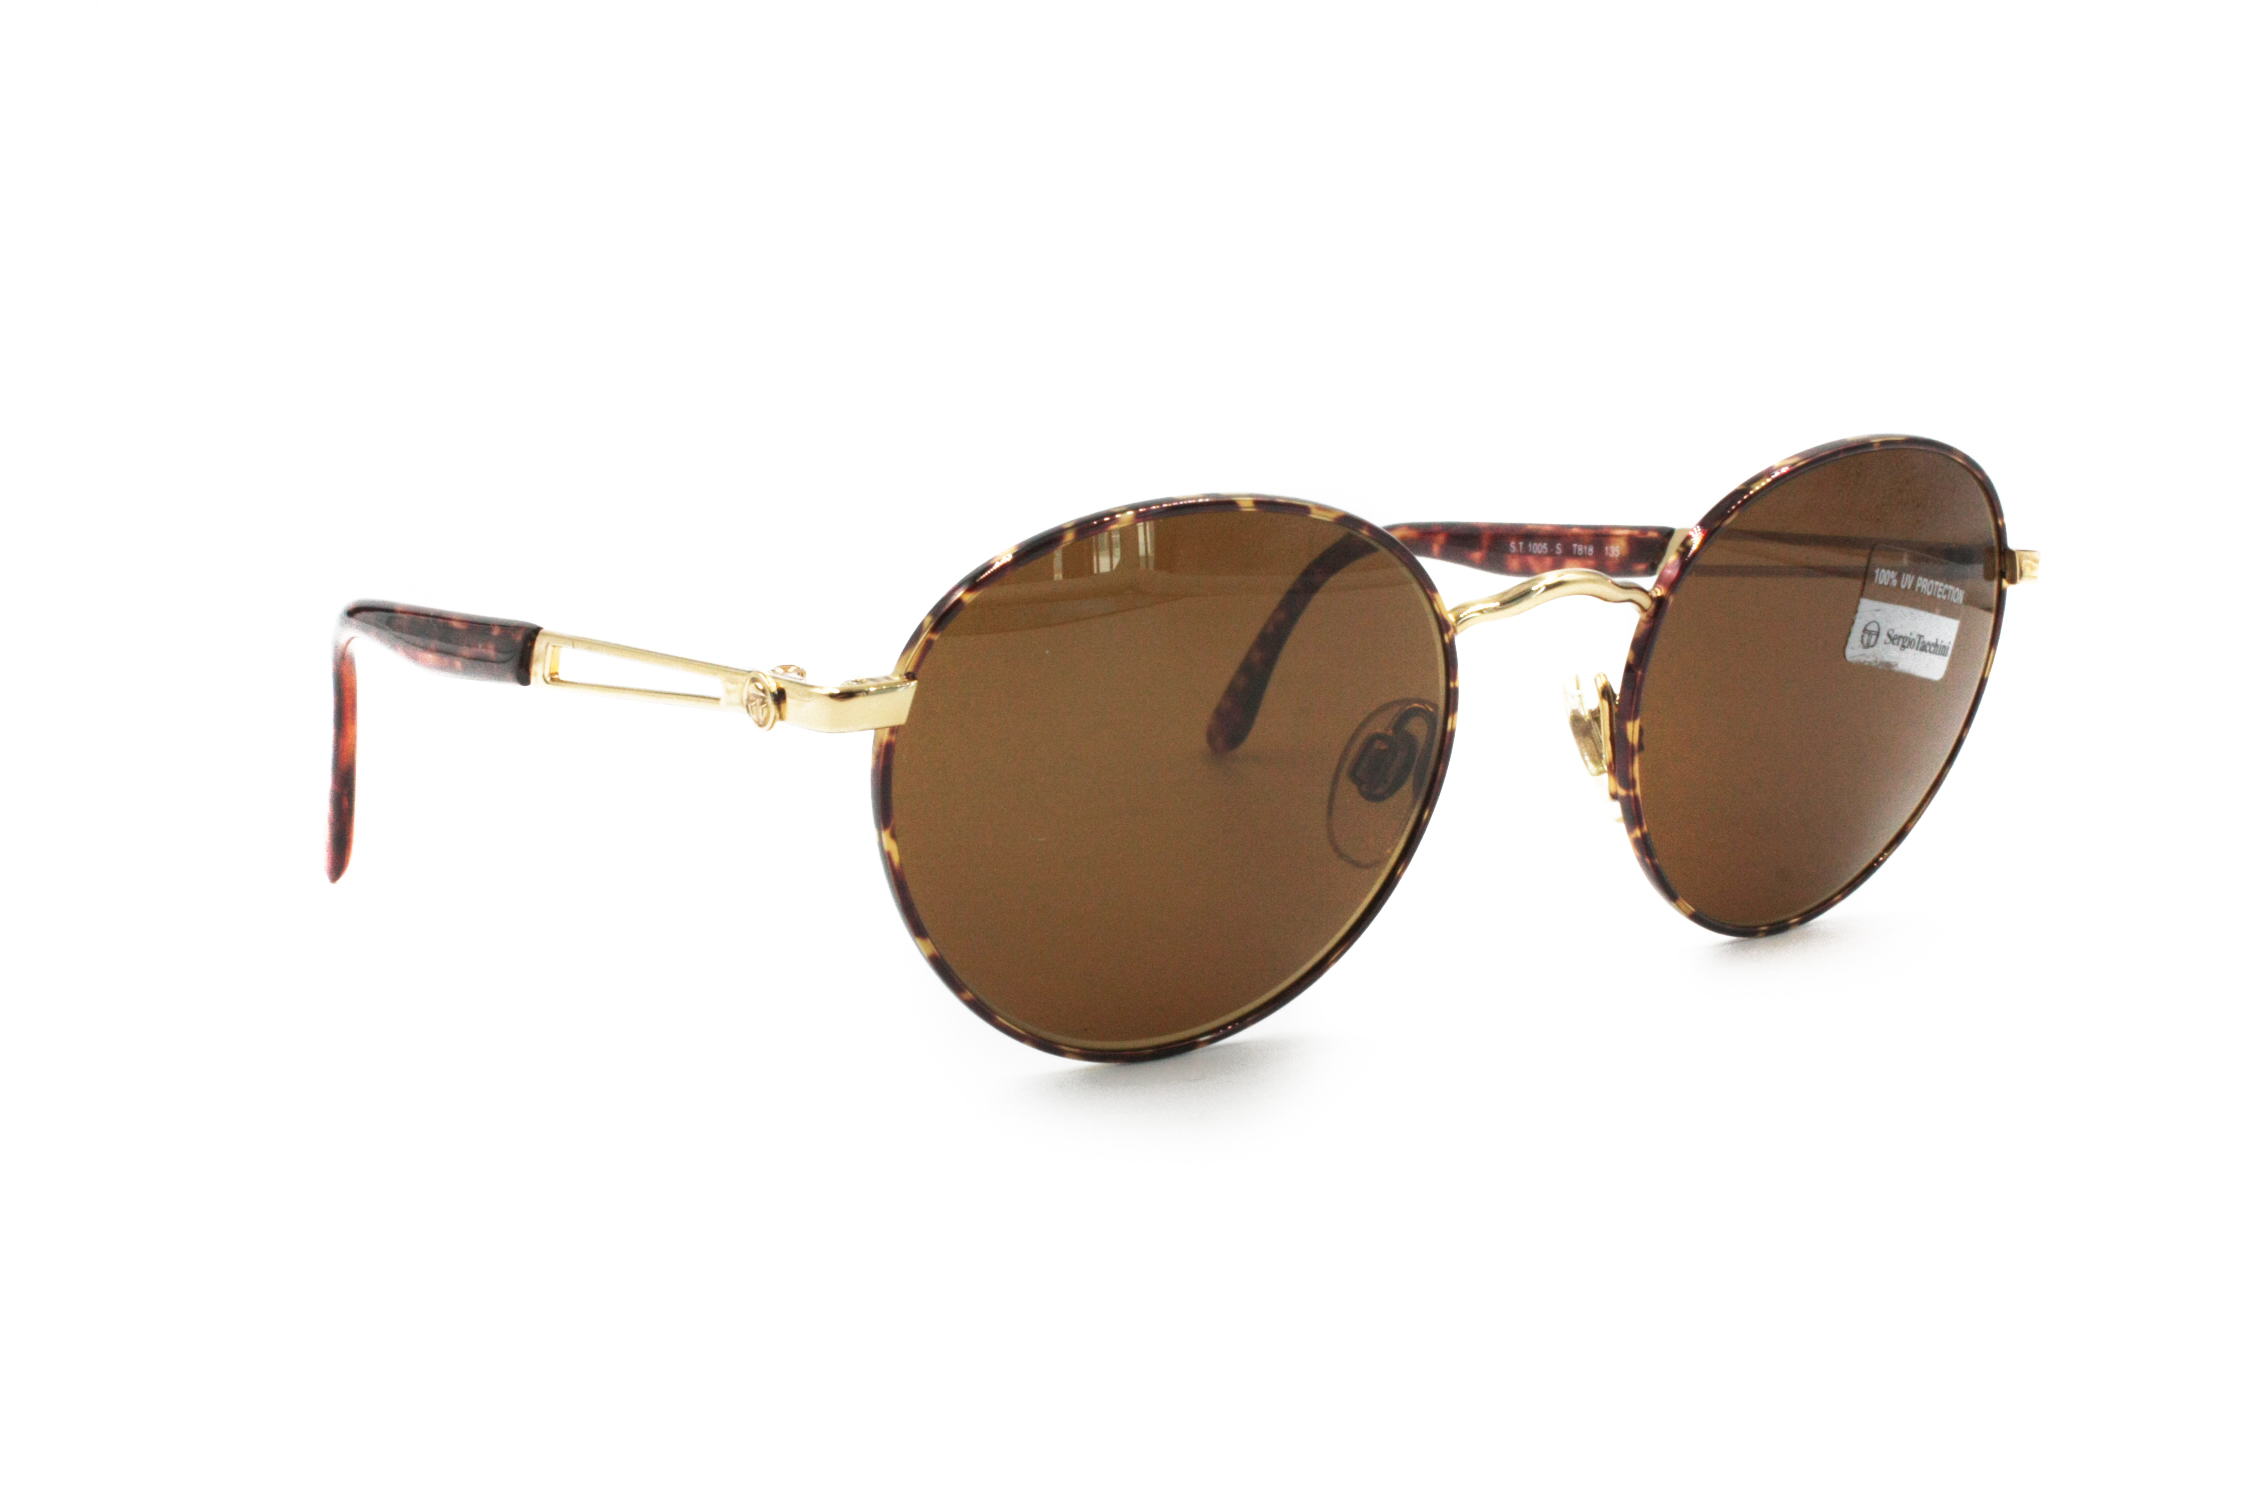 f3ae7c1c57 Sergio Tacchini Vintage SERGIO TACHINI sunglasses golden   brown dappled     Vintage Italian designer sunglasses 80s    New Old stock eyewear Size one  size ...